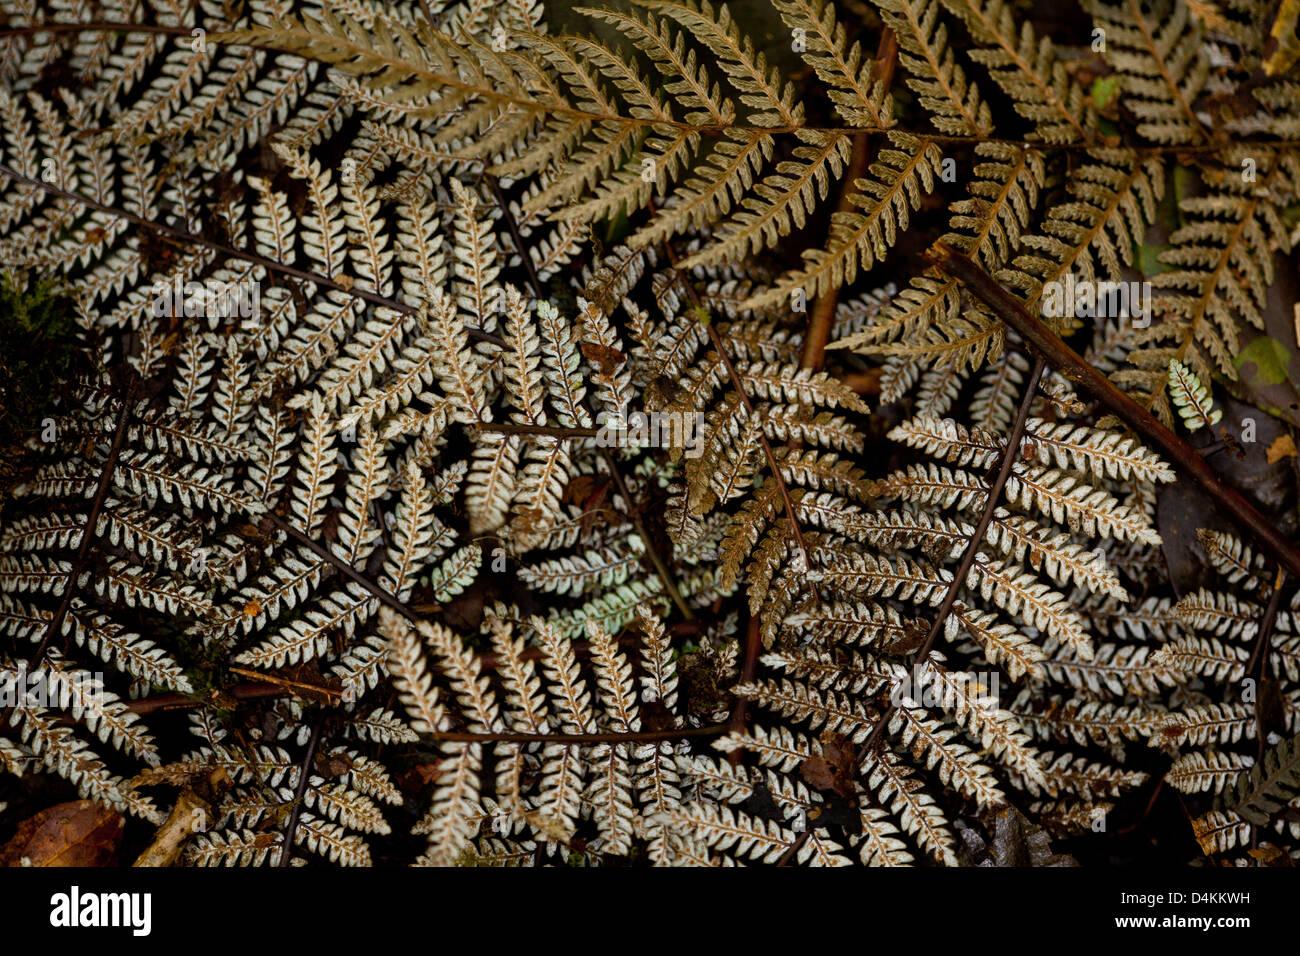 Leaf structures in La Amistad national park, Panama province, Republic of Panama. - Stock Image